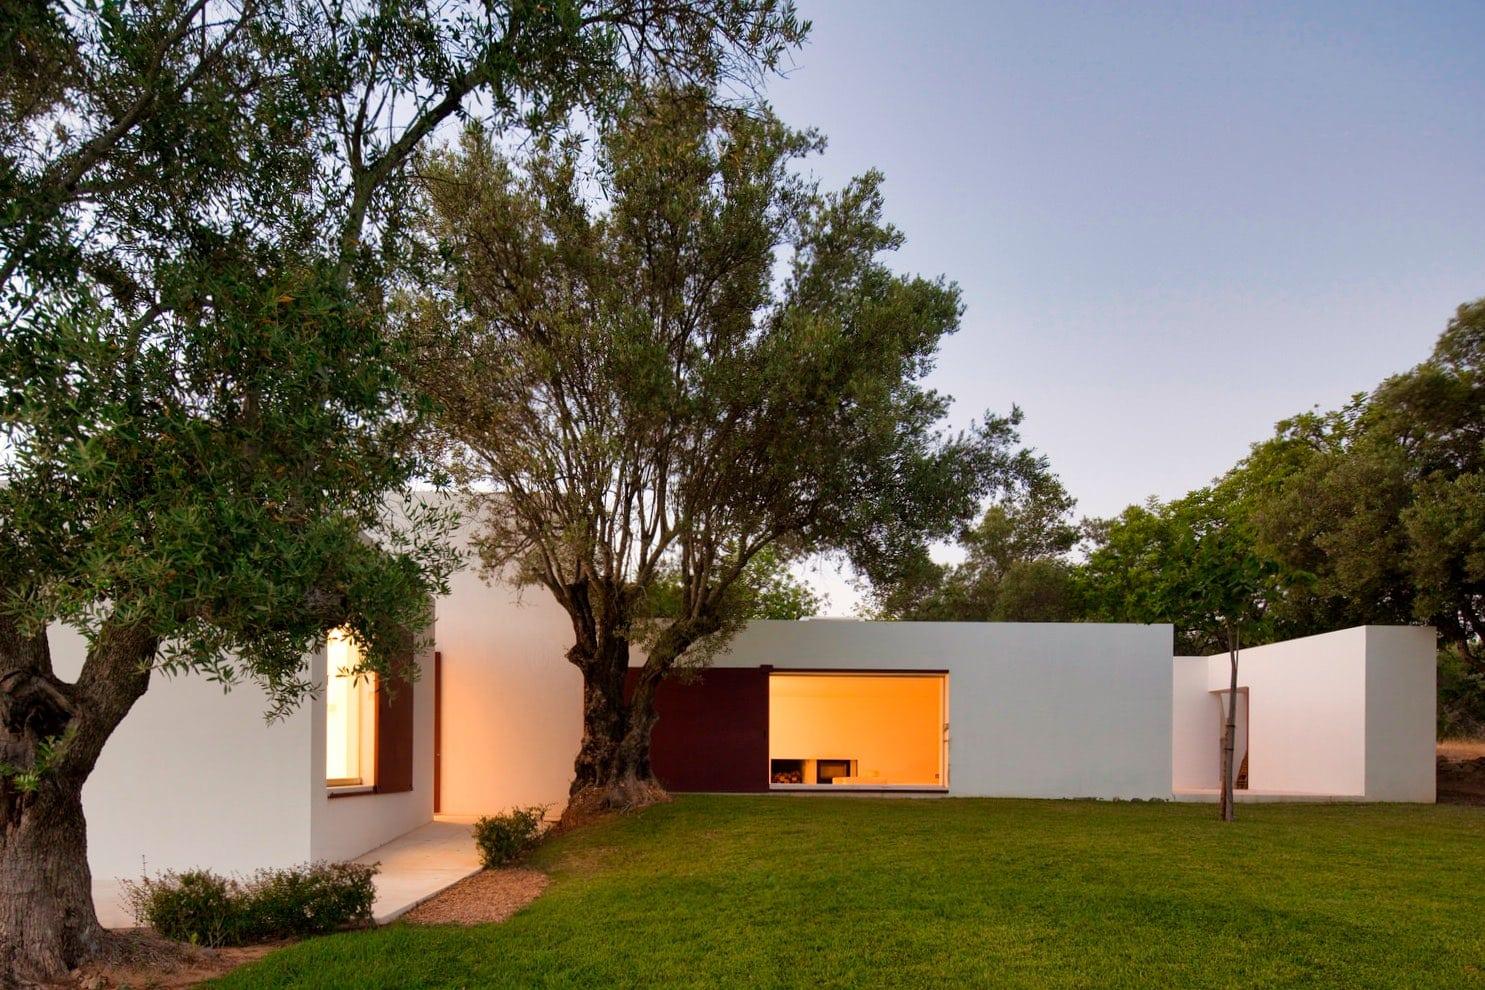 Zalig-Algarve-Casa-Agostos-147-1